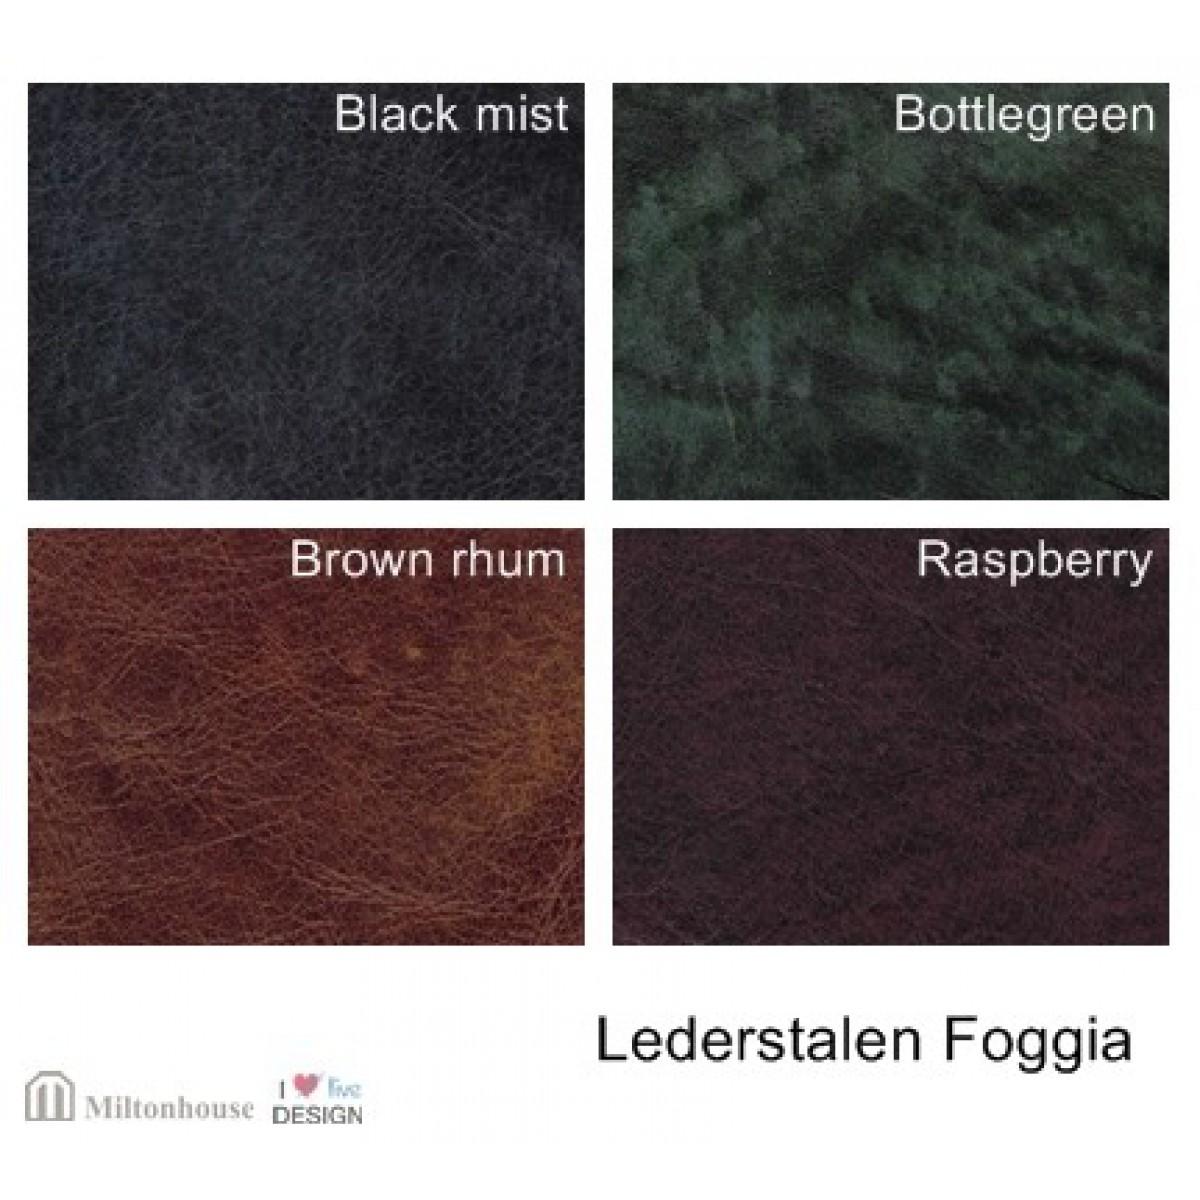 foggia-leder-stalen-leer-het-anker-l'ancora